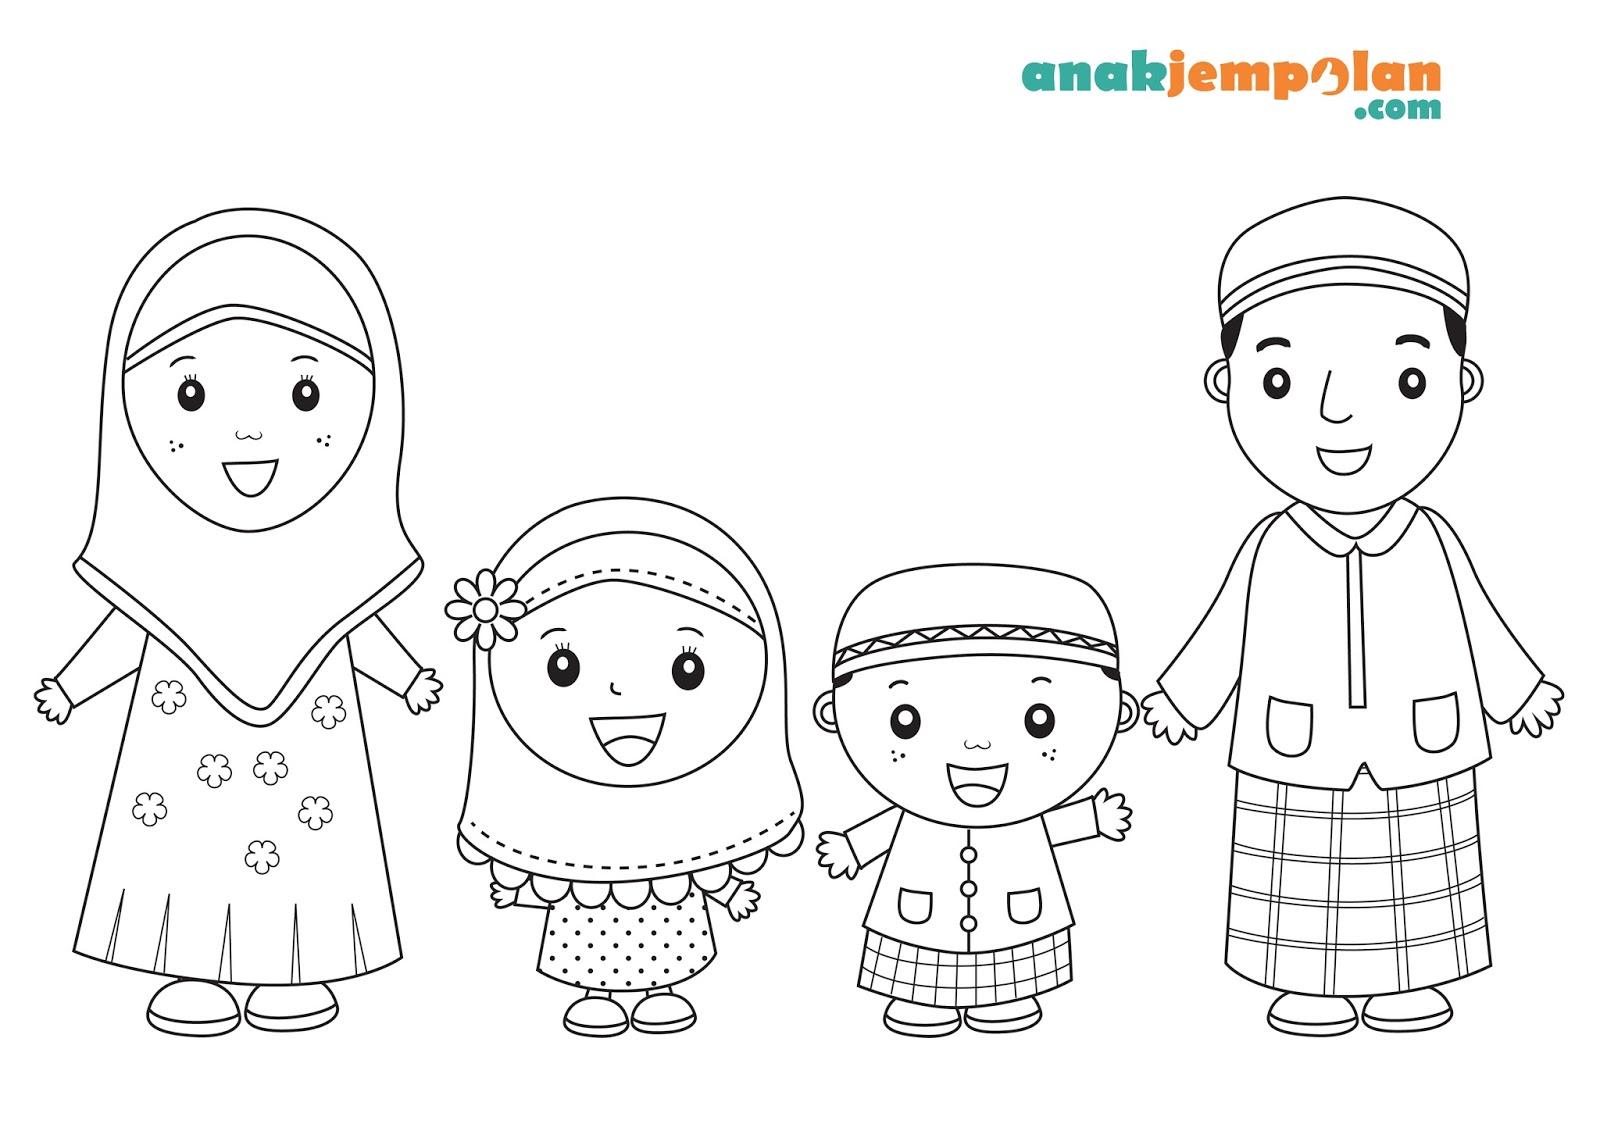 Gambar Kartun Anak Berbakti Kepada Orang Tua | Top Gambar